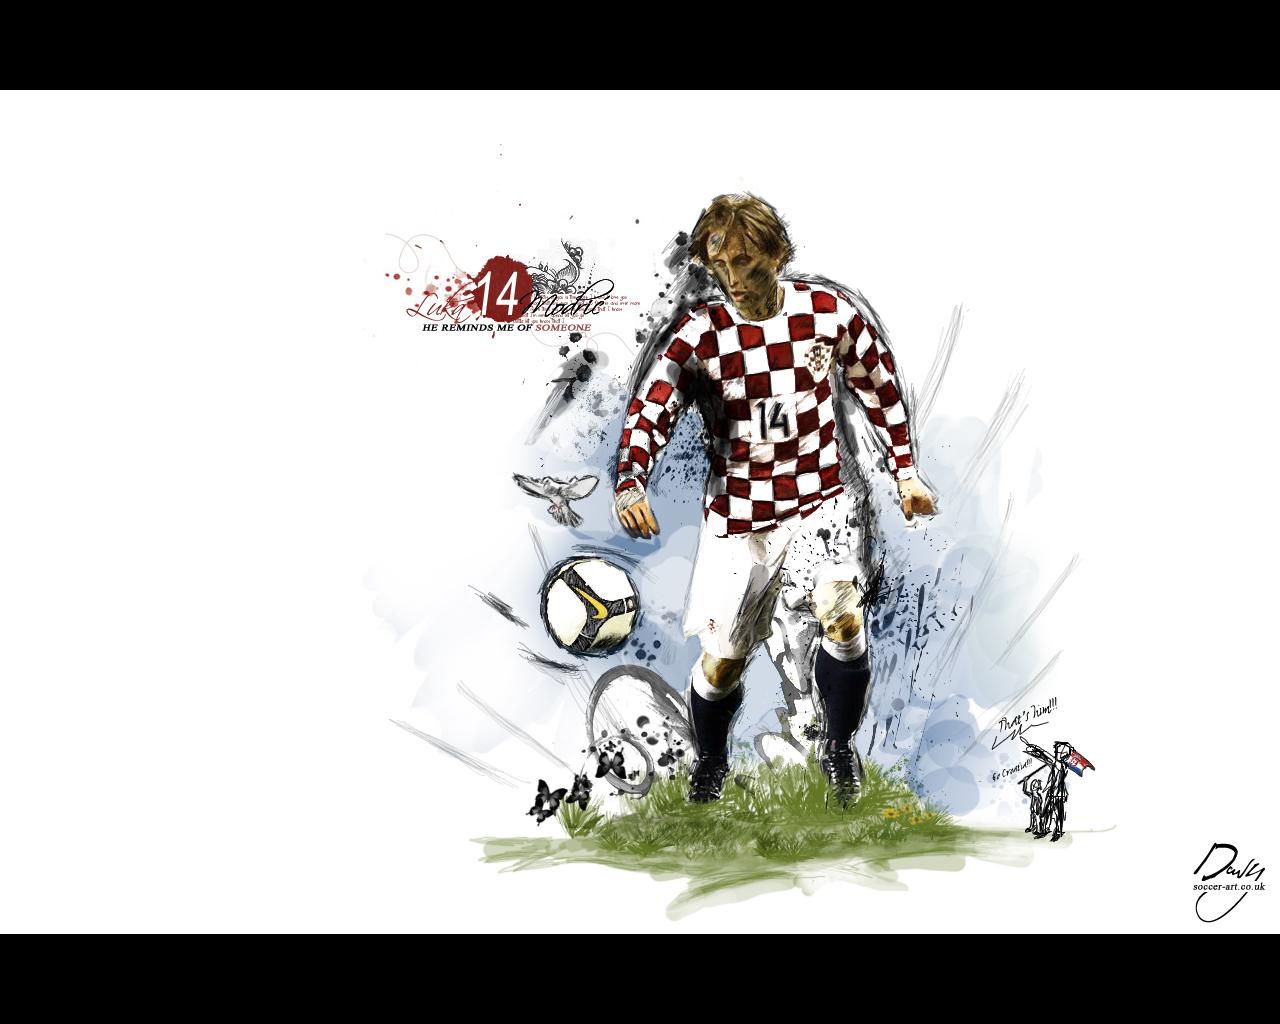 2011 2011 Luka Modric 2011 luka_modric_croatia_euro2008.jpg